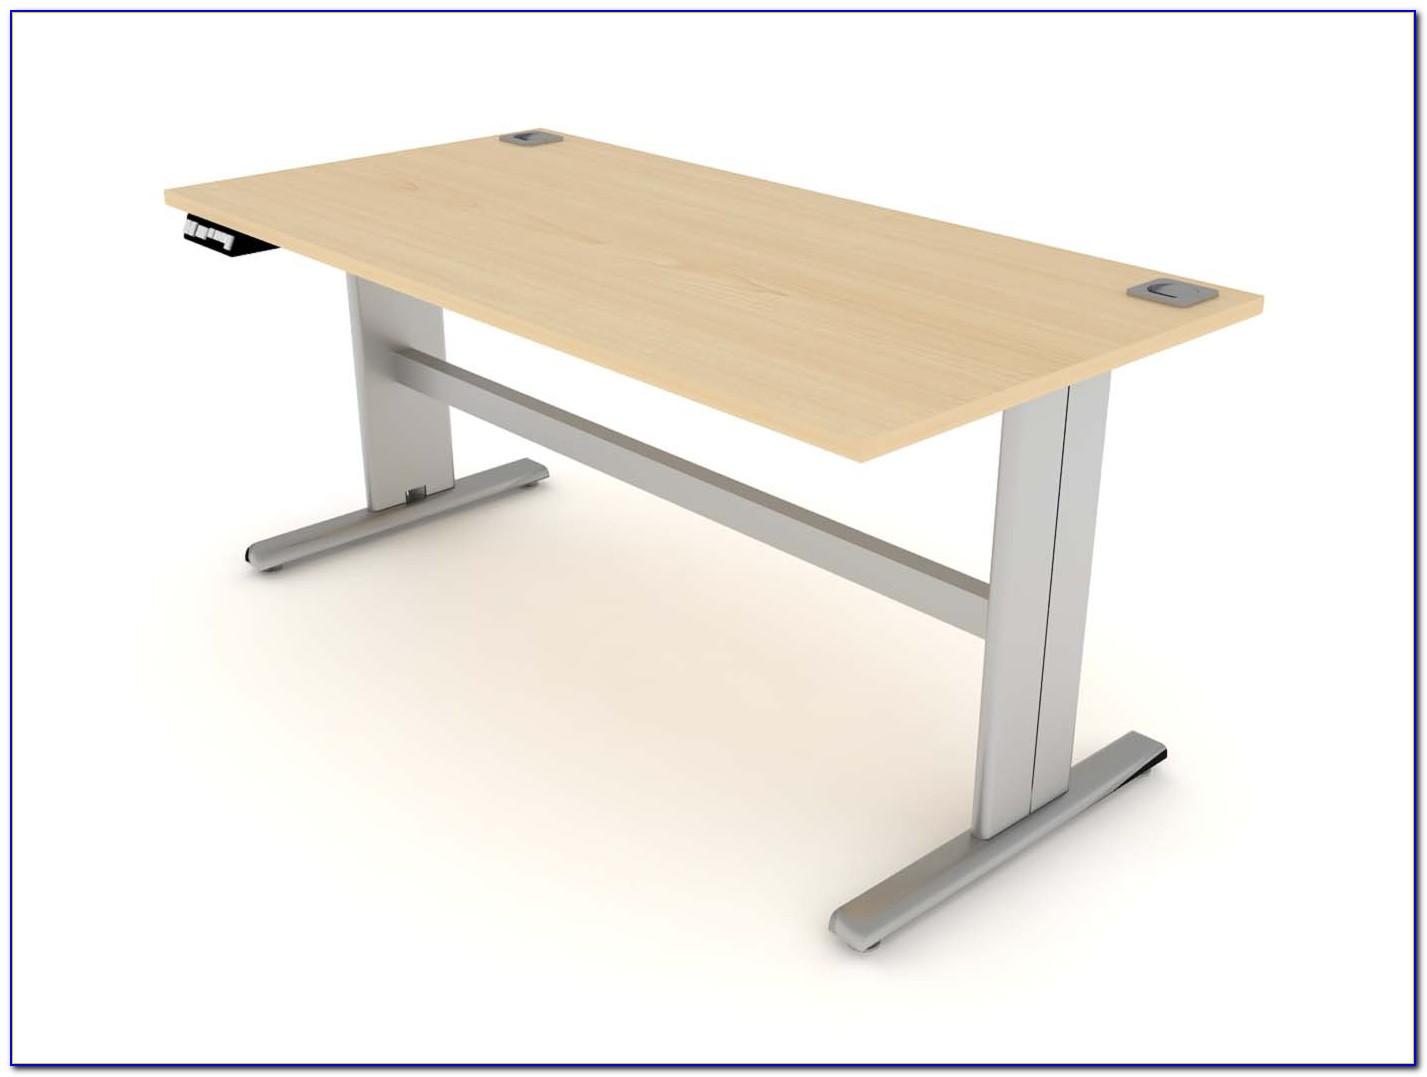 Electric Adjustable Height Desk Ikea